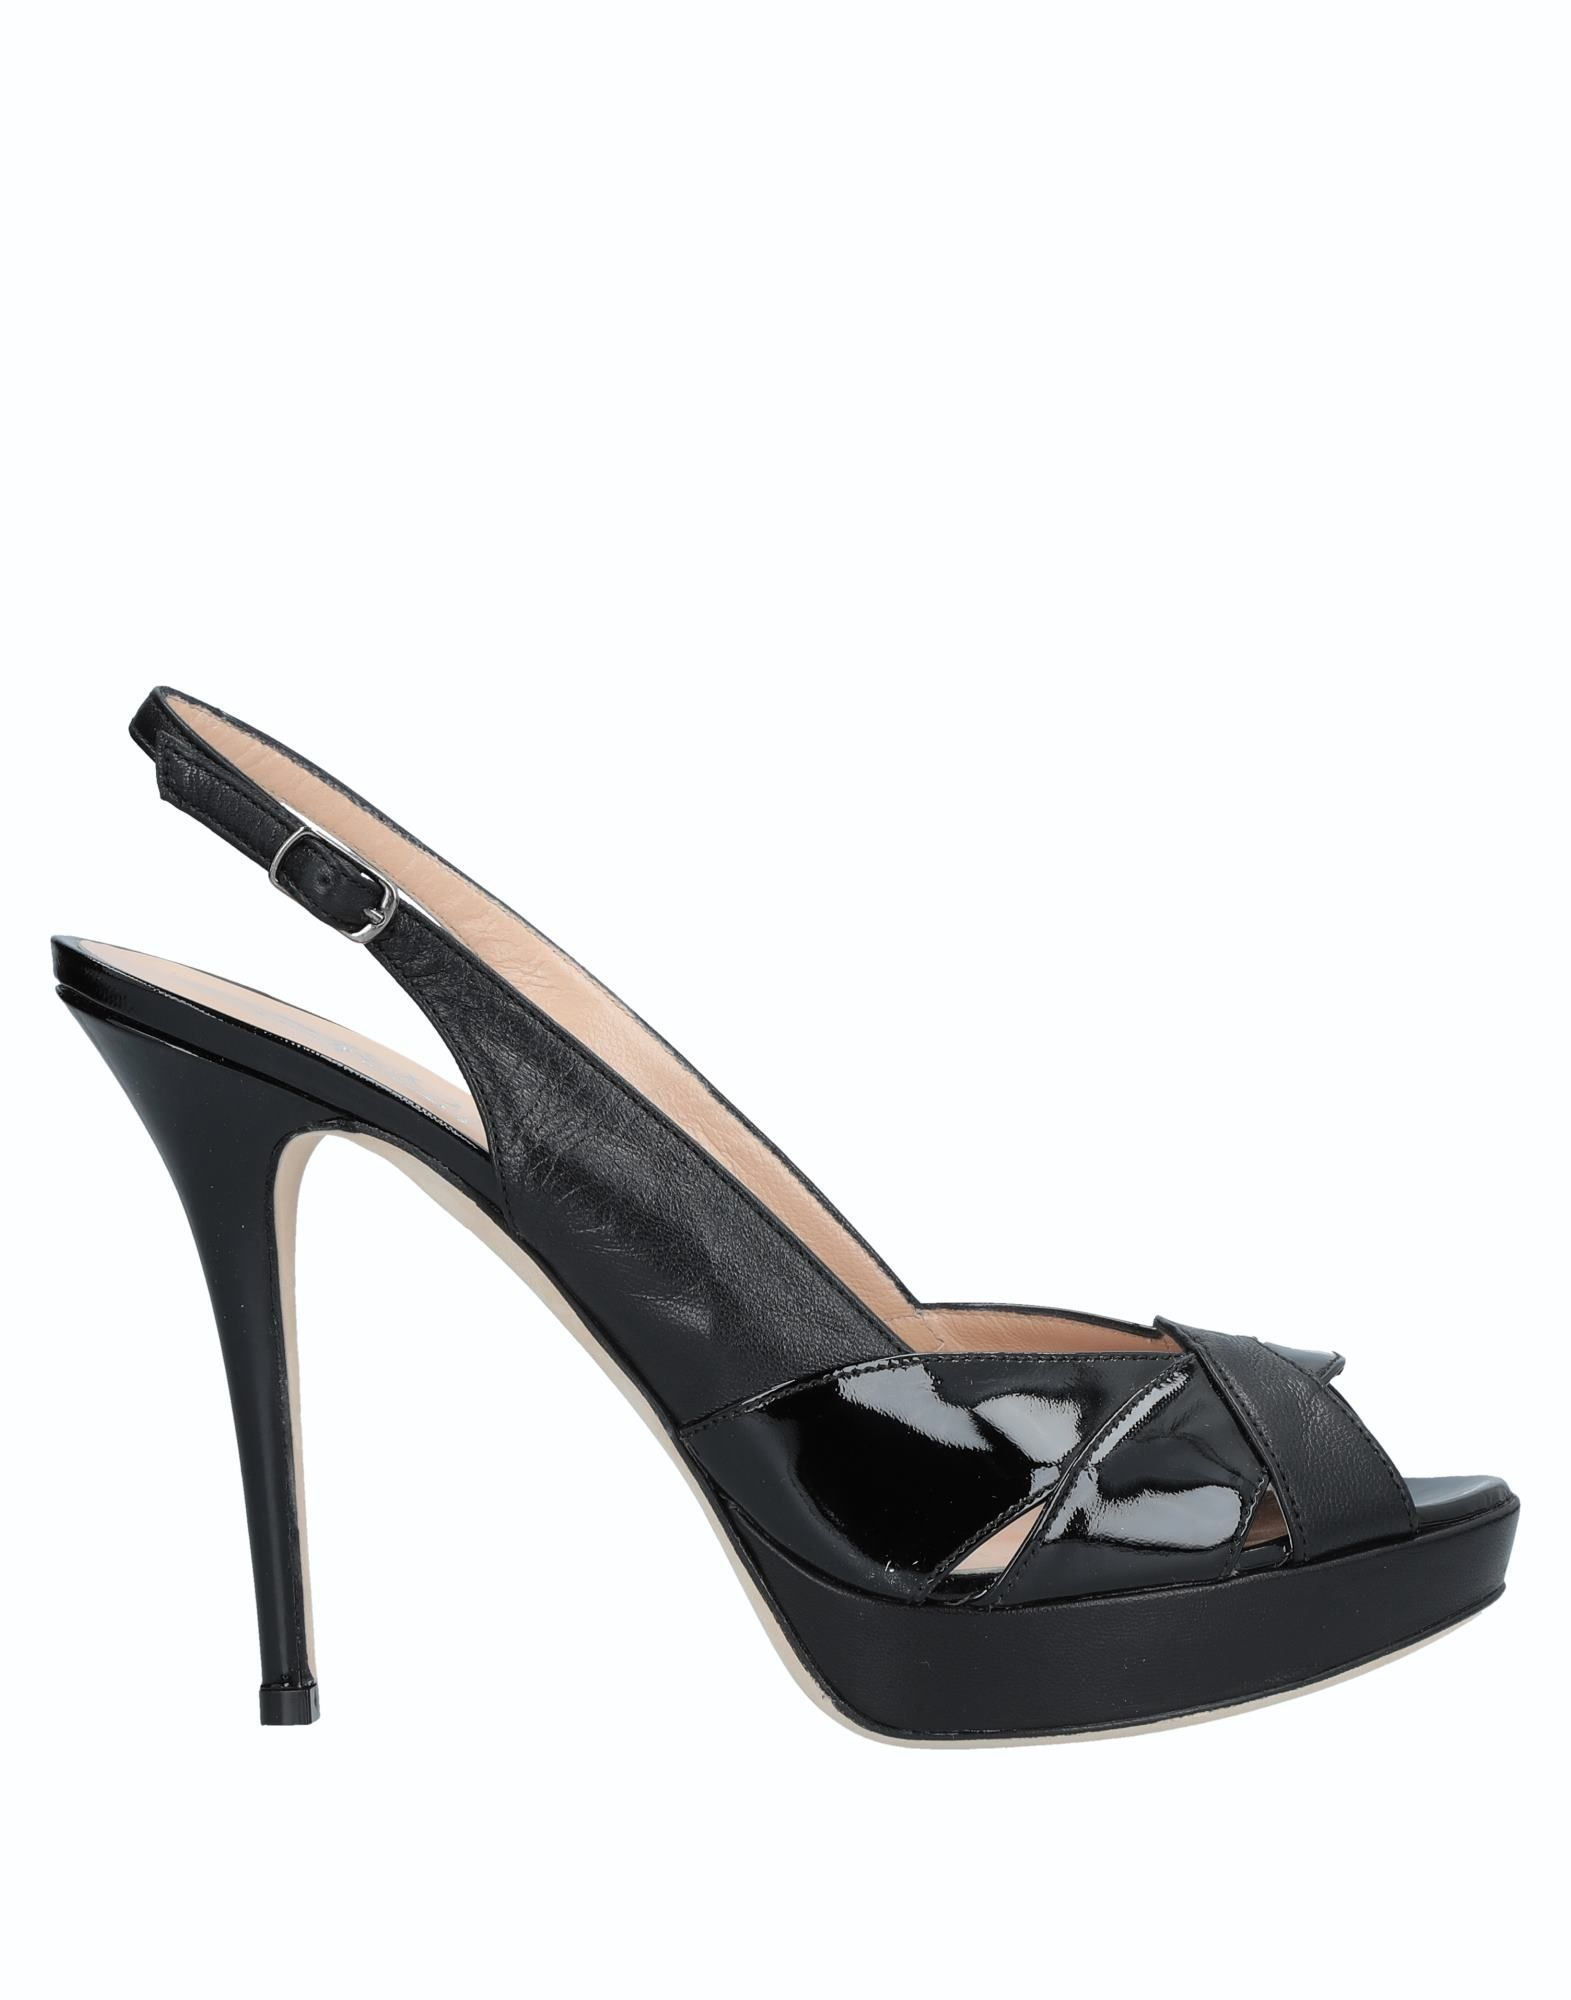 1,618 Sandalen Damen  11537350KB Gute Qualität beliebte Schuhe